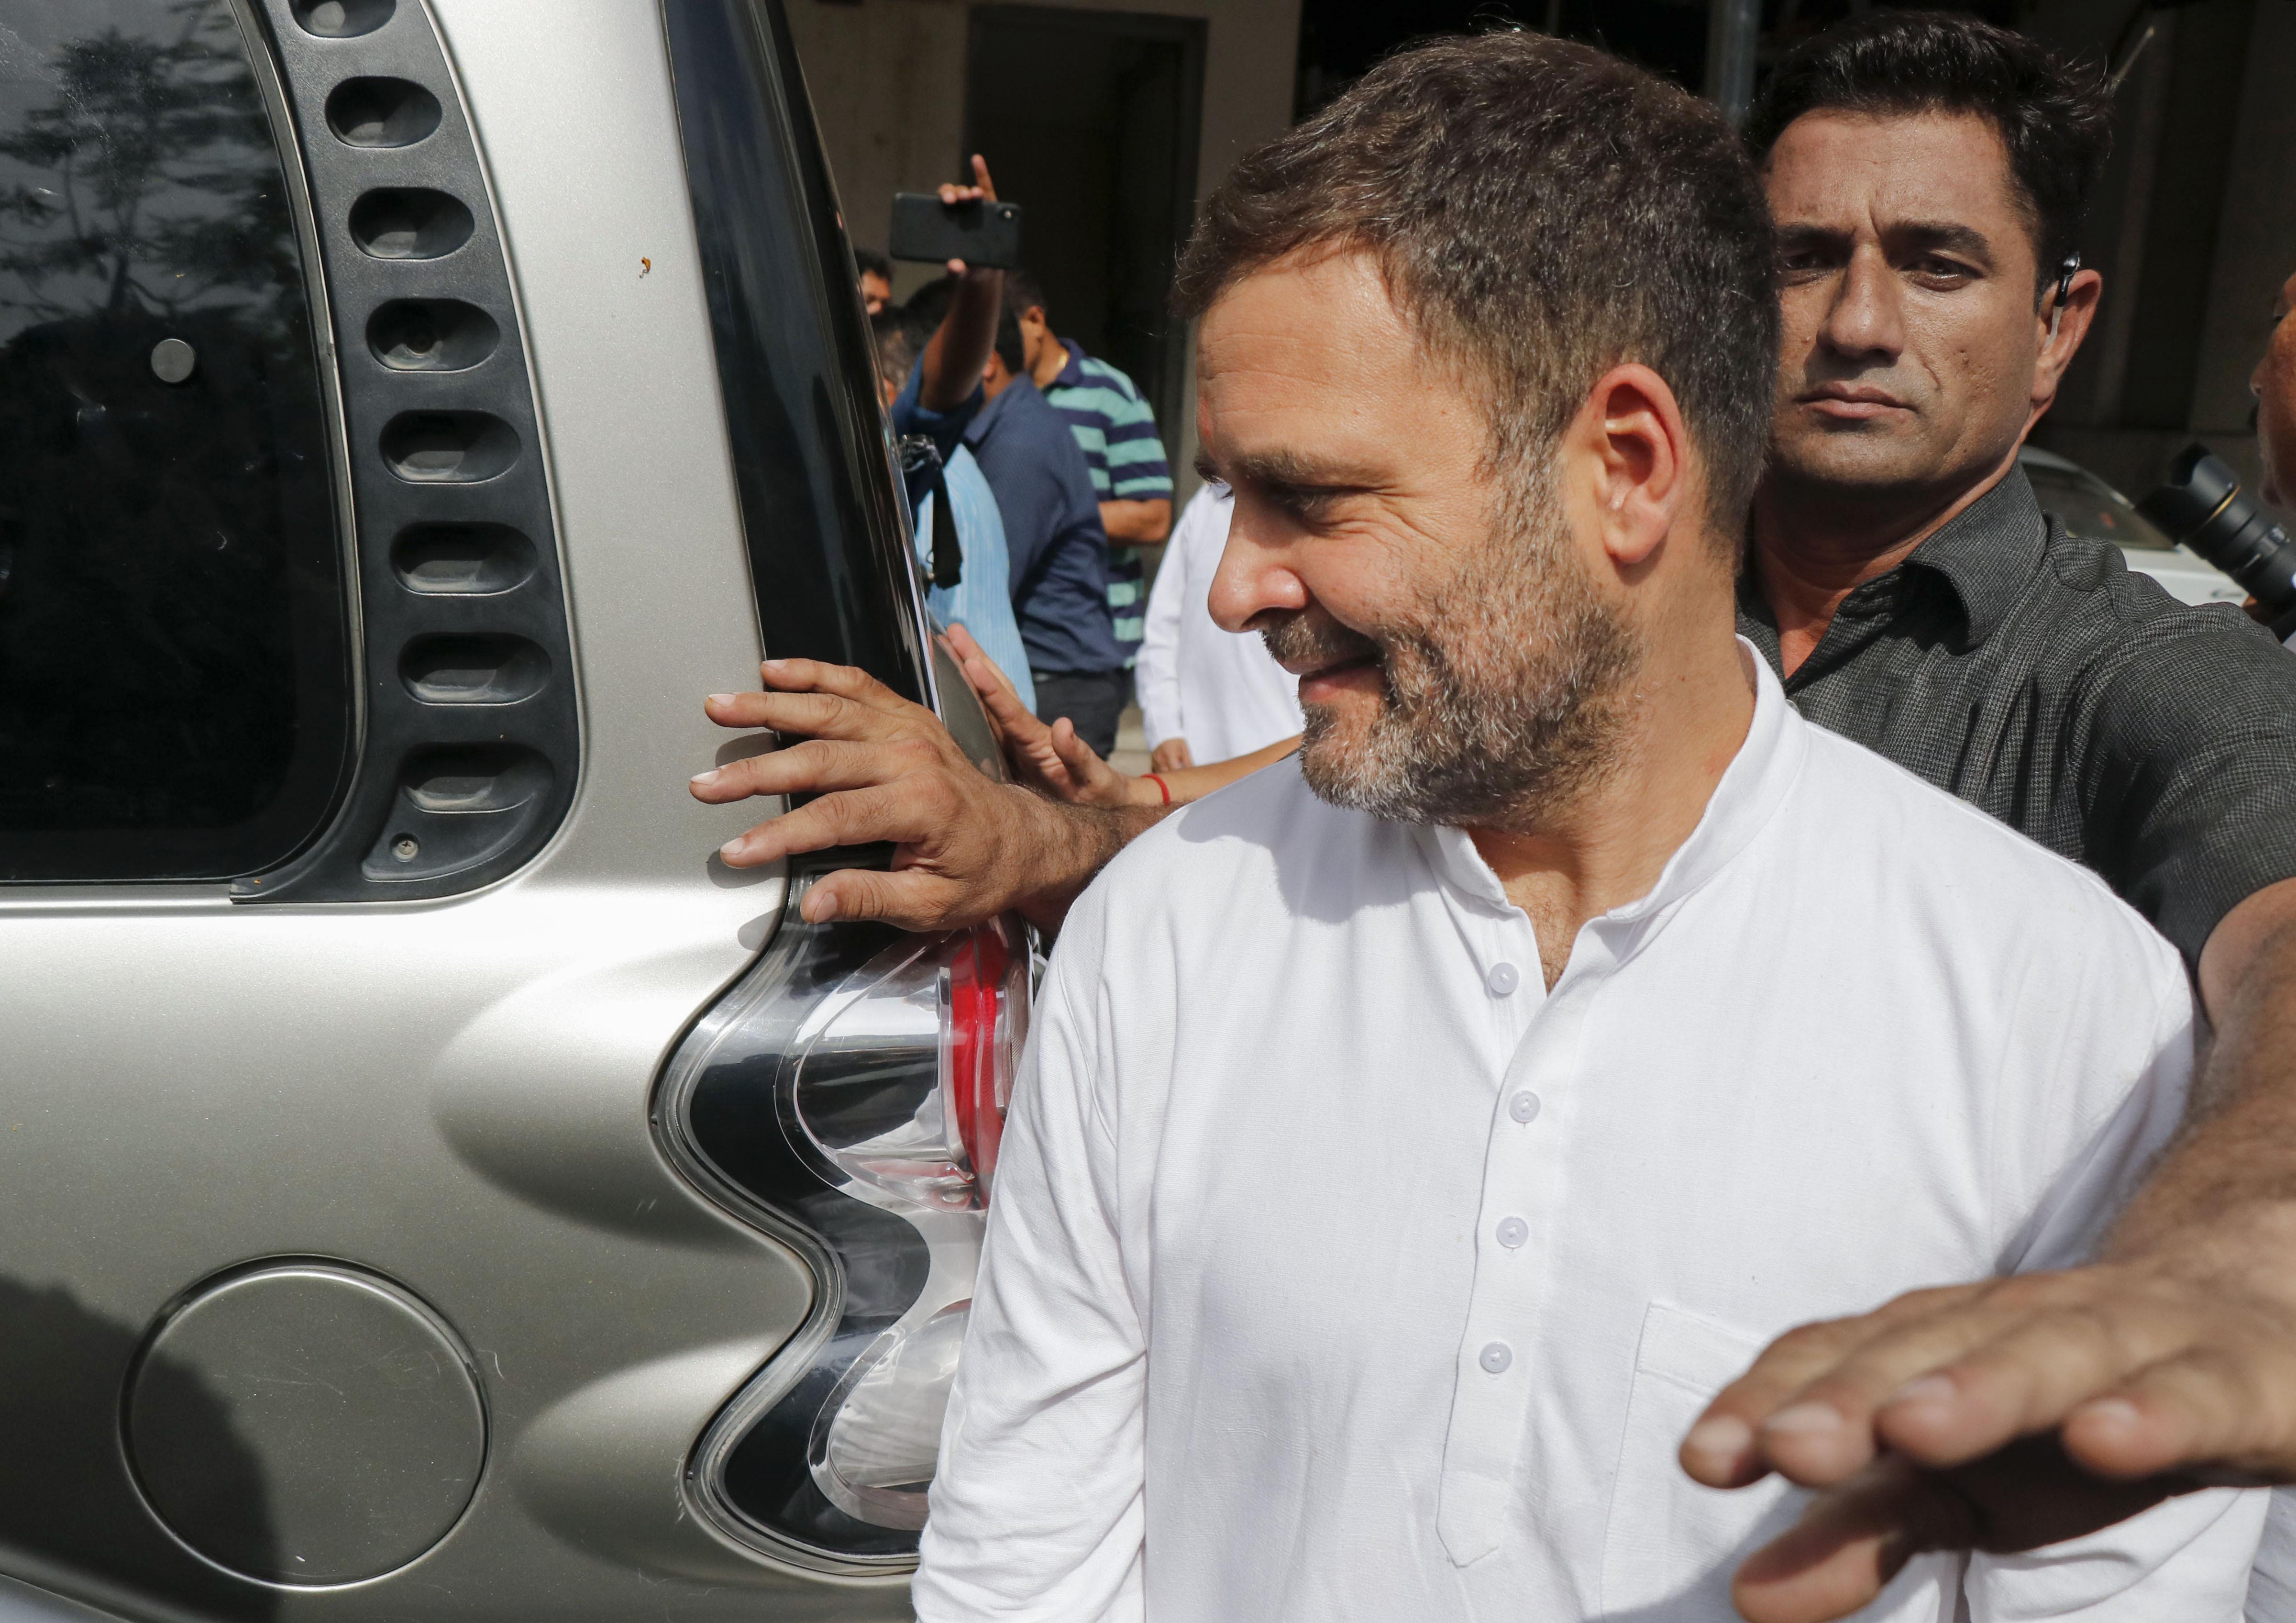 Congress president Rahul Gandhi leaves the metropolitan court in Ahmedabad on July 12.